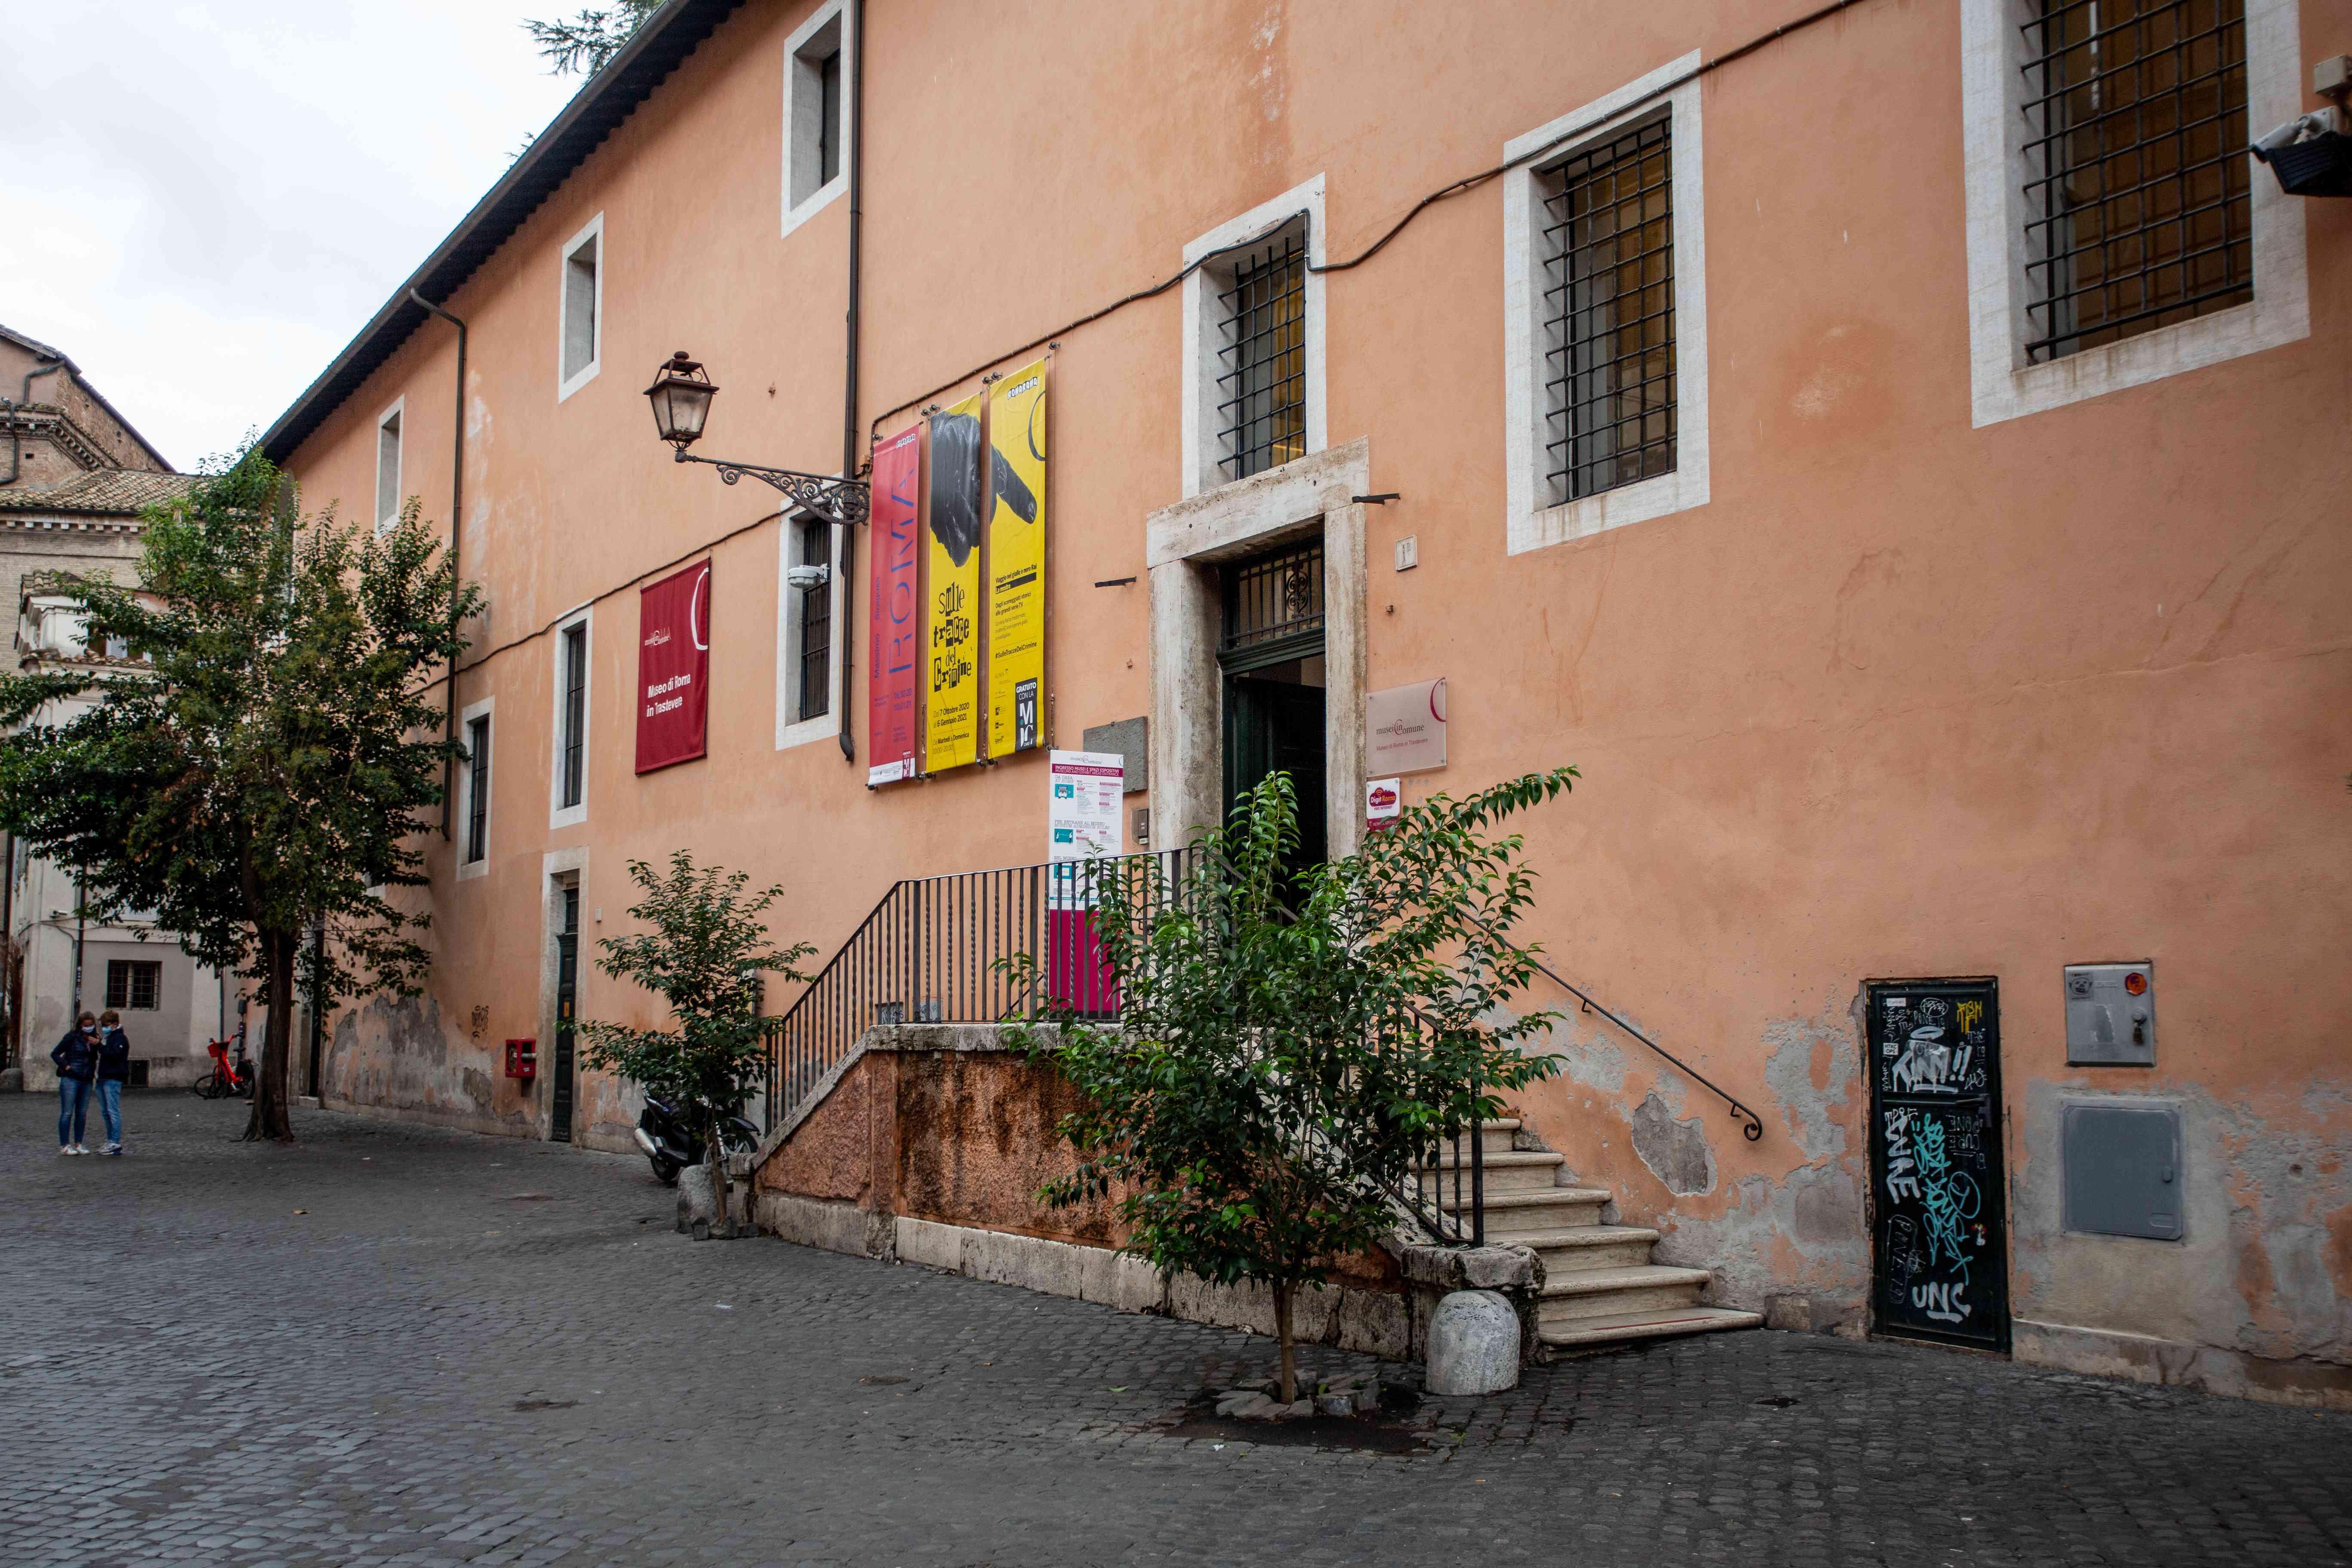 Museum of Rome in Trastevere, Rome